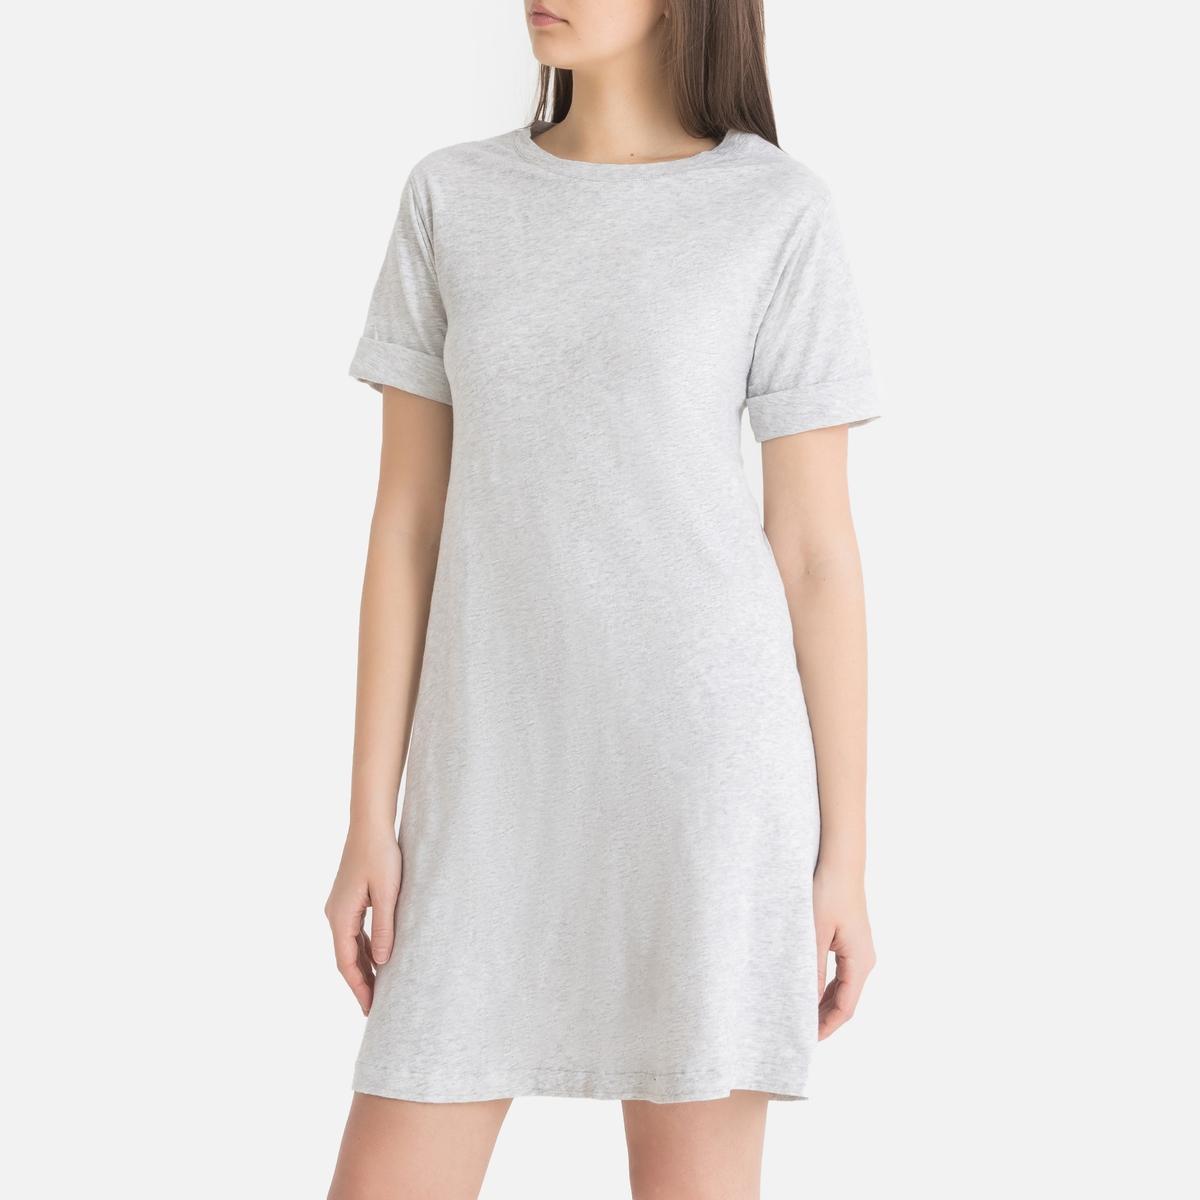 цена Платье-футболка La Redoute С короткими рукавами BYSAPICK M серый